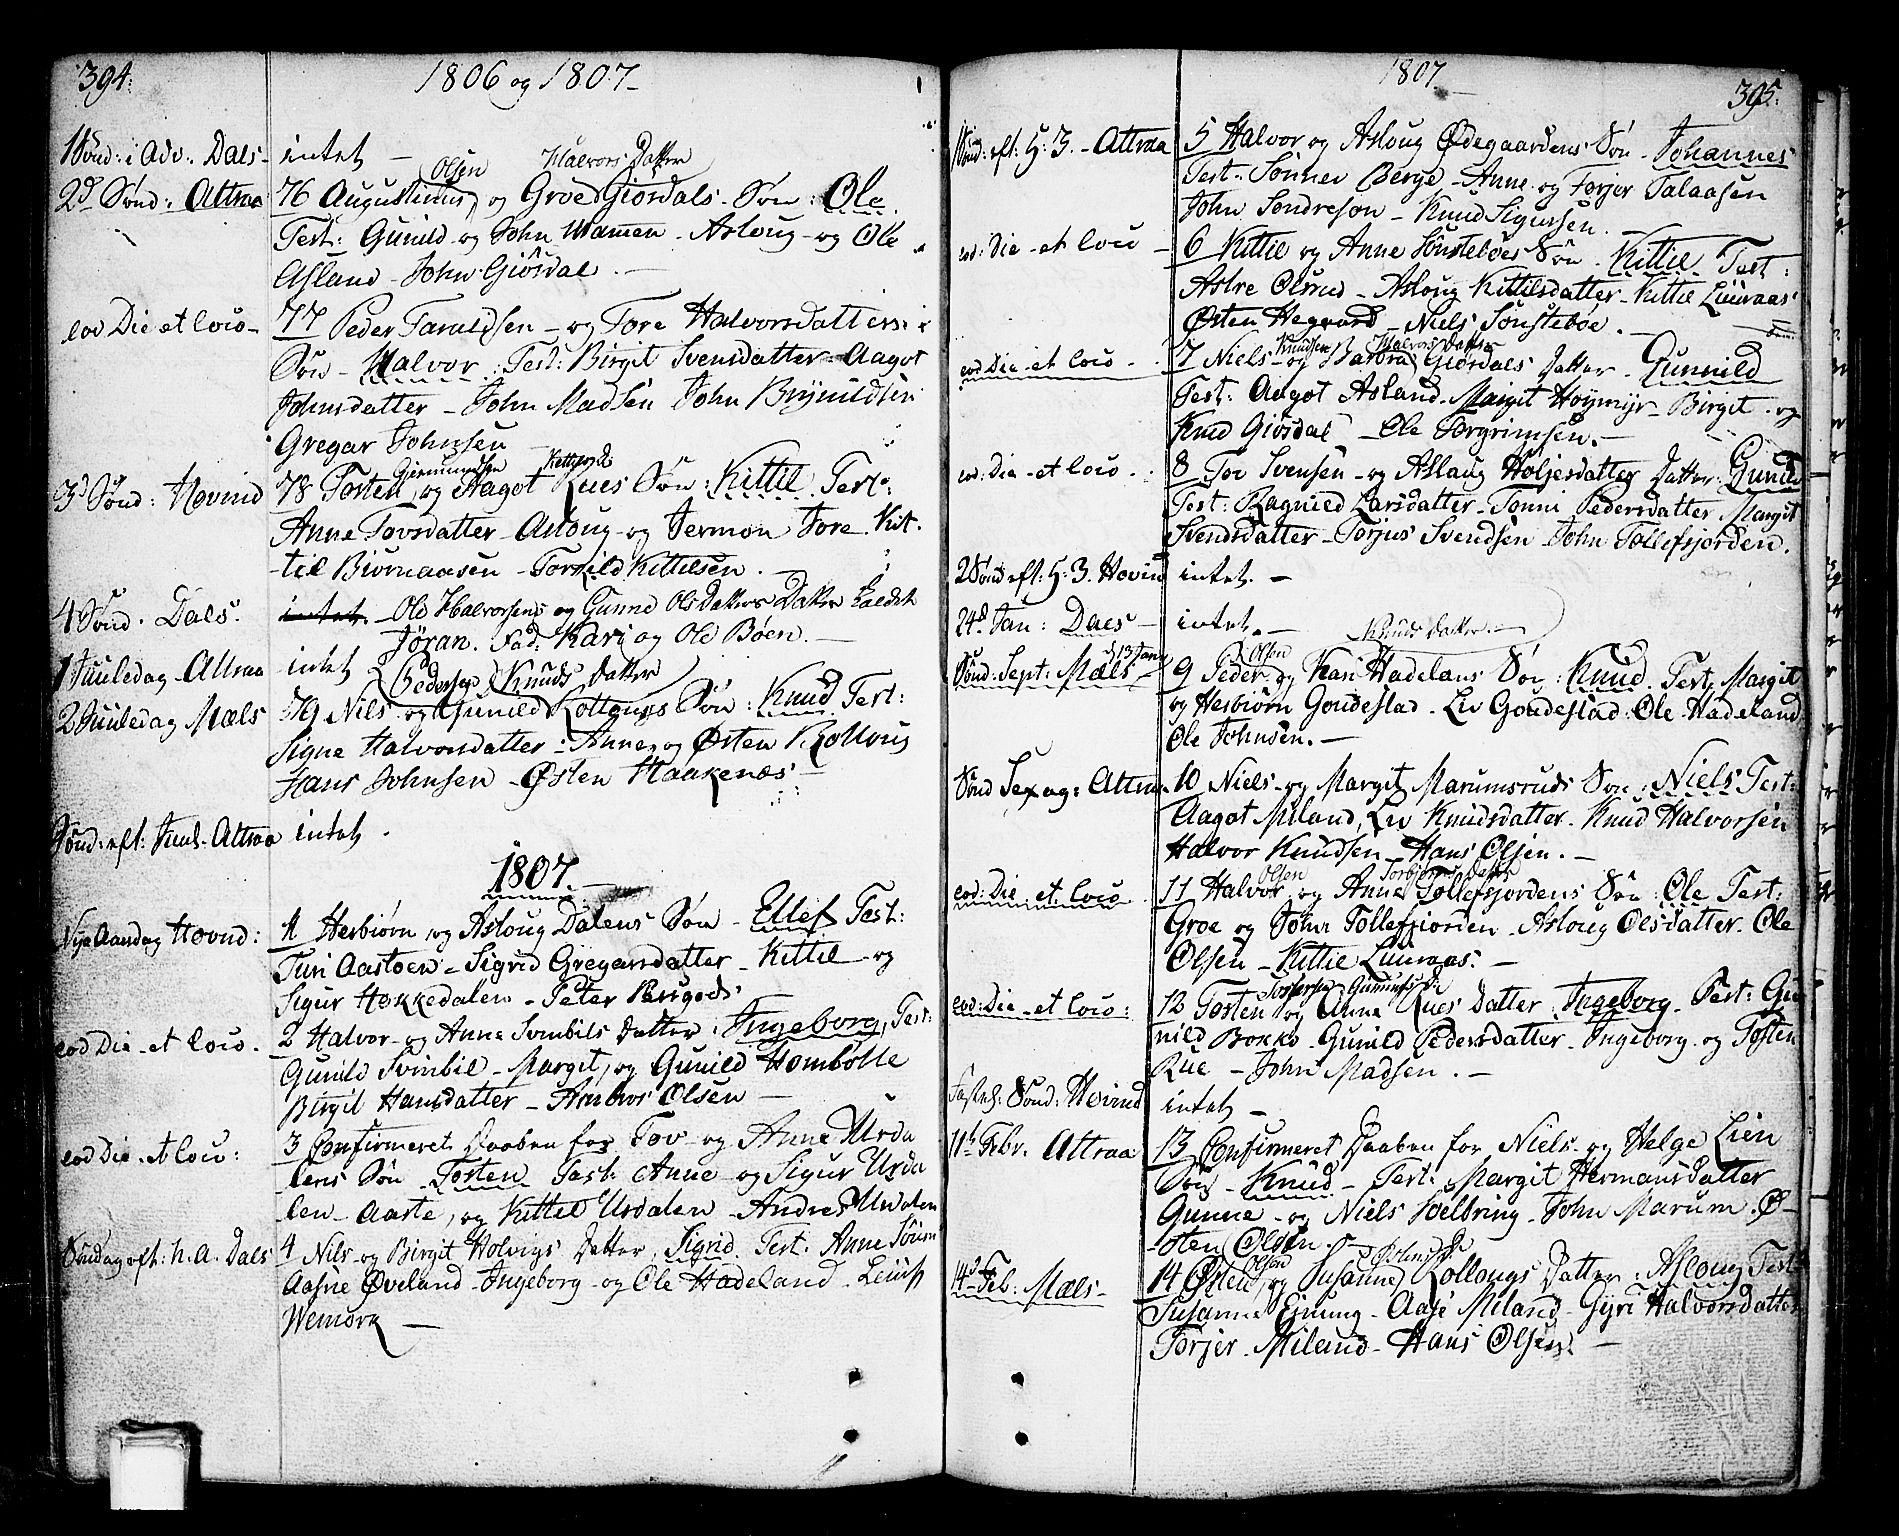 SAKO, Tinn kirkebøker, F/Fa/L0002: Ministerialbok nr. I 2, 1757-1810, s. 394-395